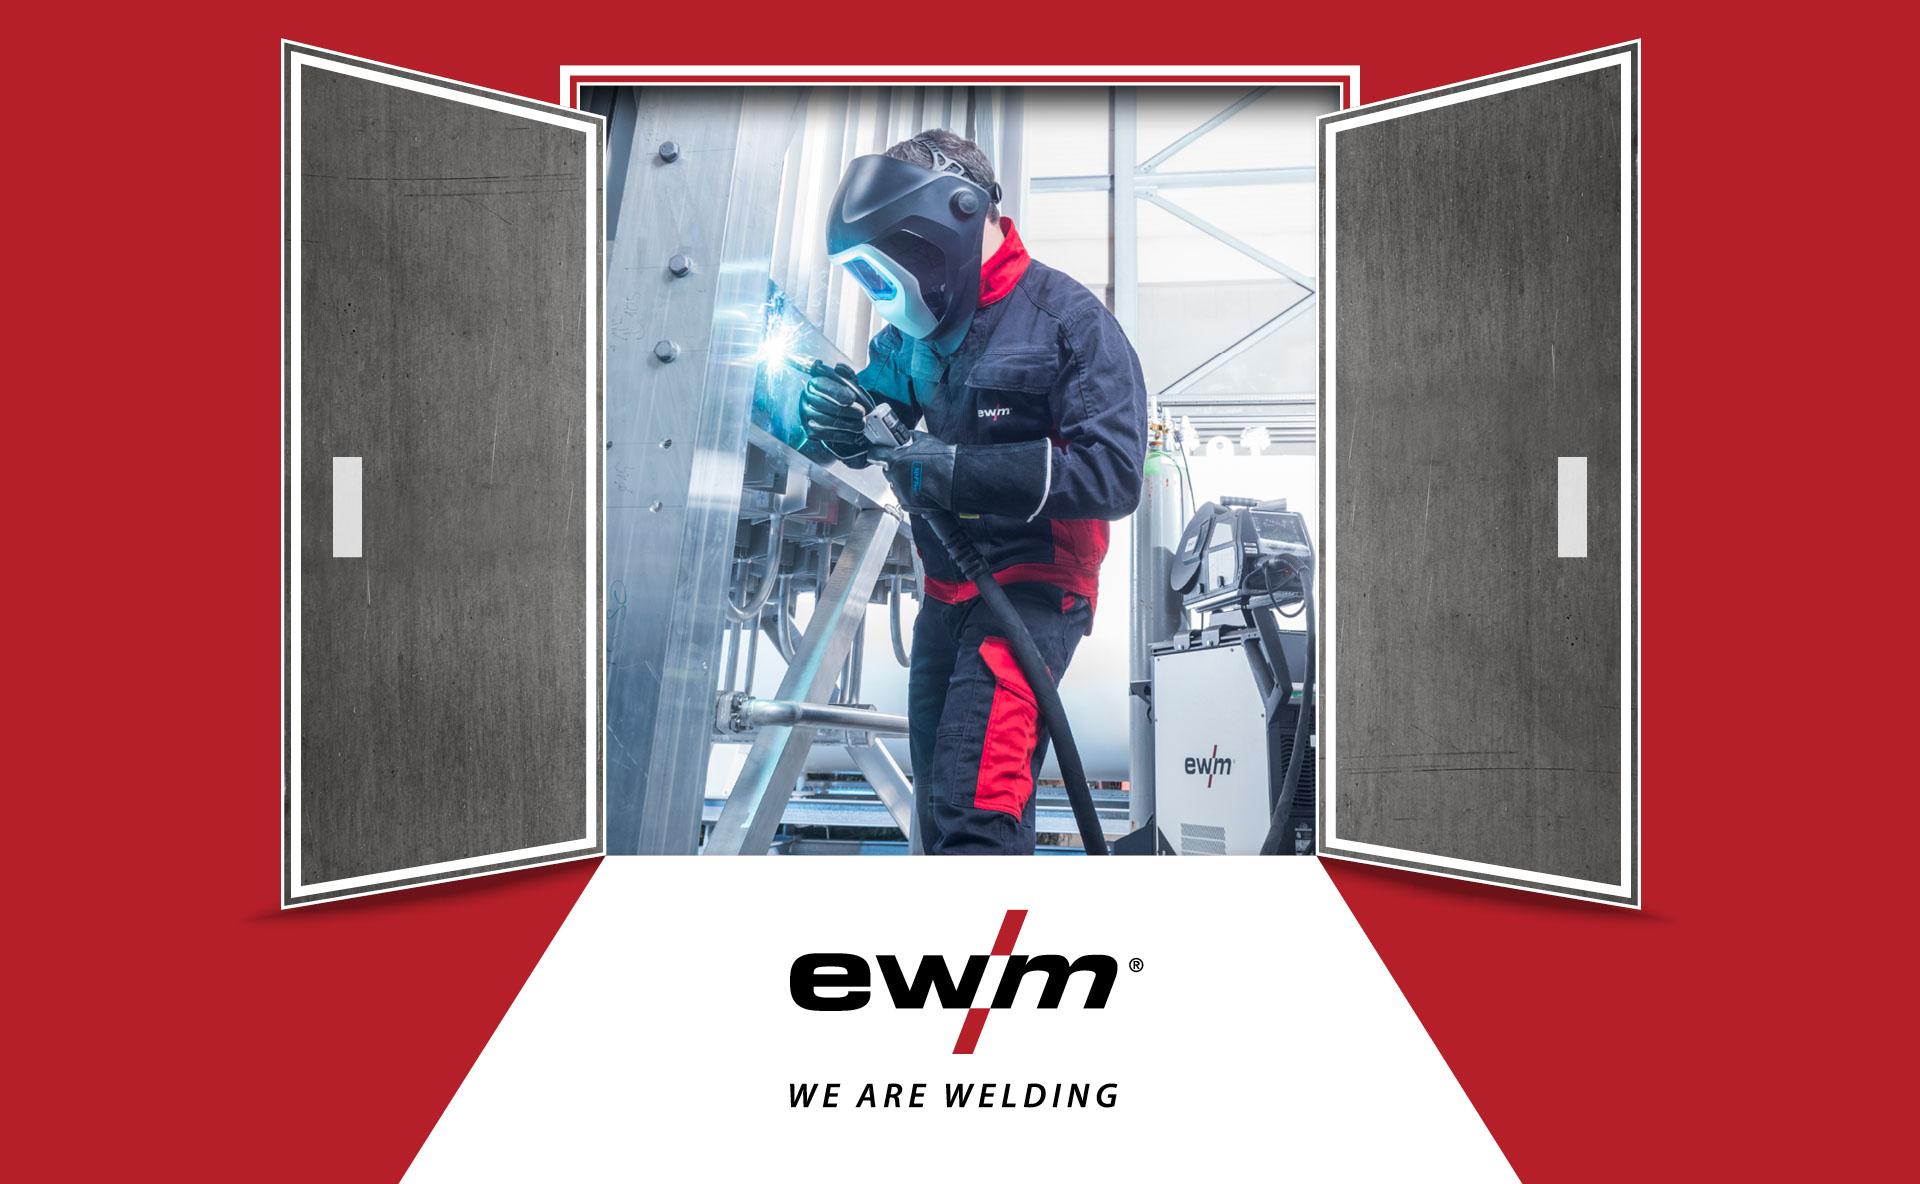 ewm austria